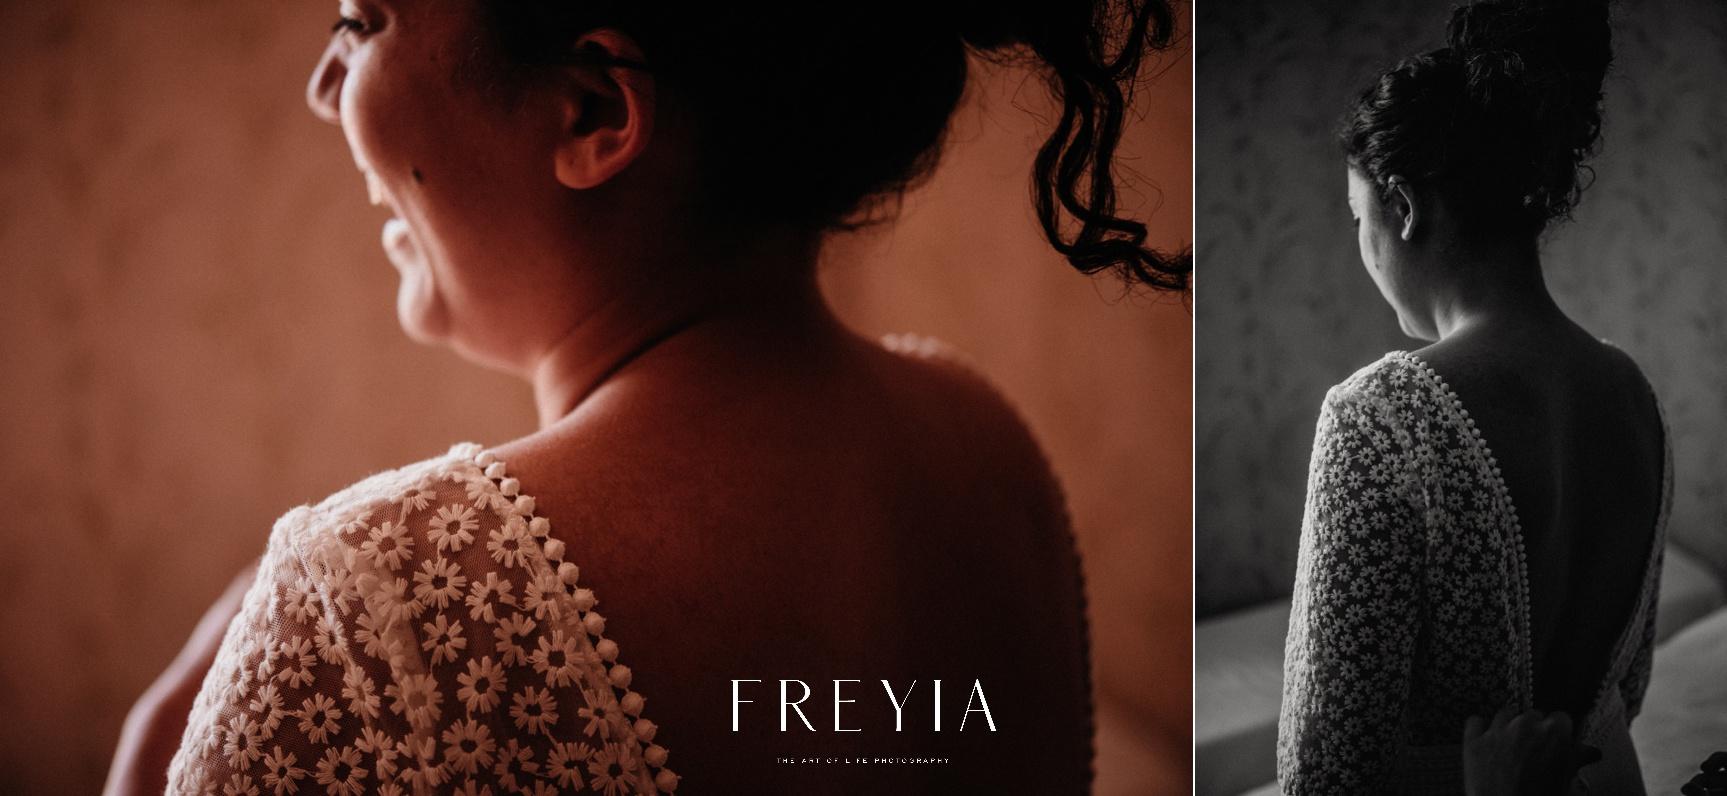 R + T |  mariage reportage alternatif moody intime minimaliste vintage naturel boho boheme |  PHOTOGRAPHE mariage PARIS france destination  | FREYIA photography_-54.jpg